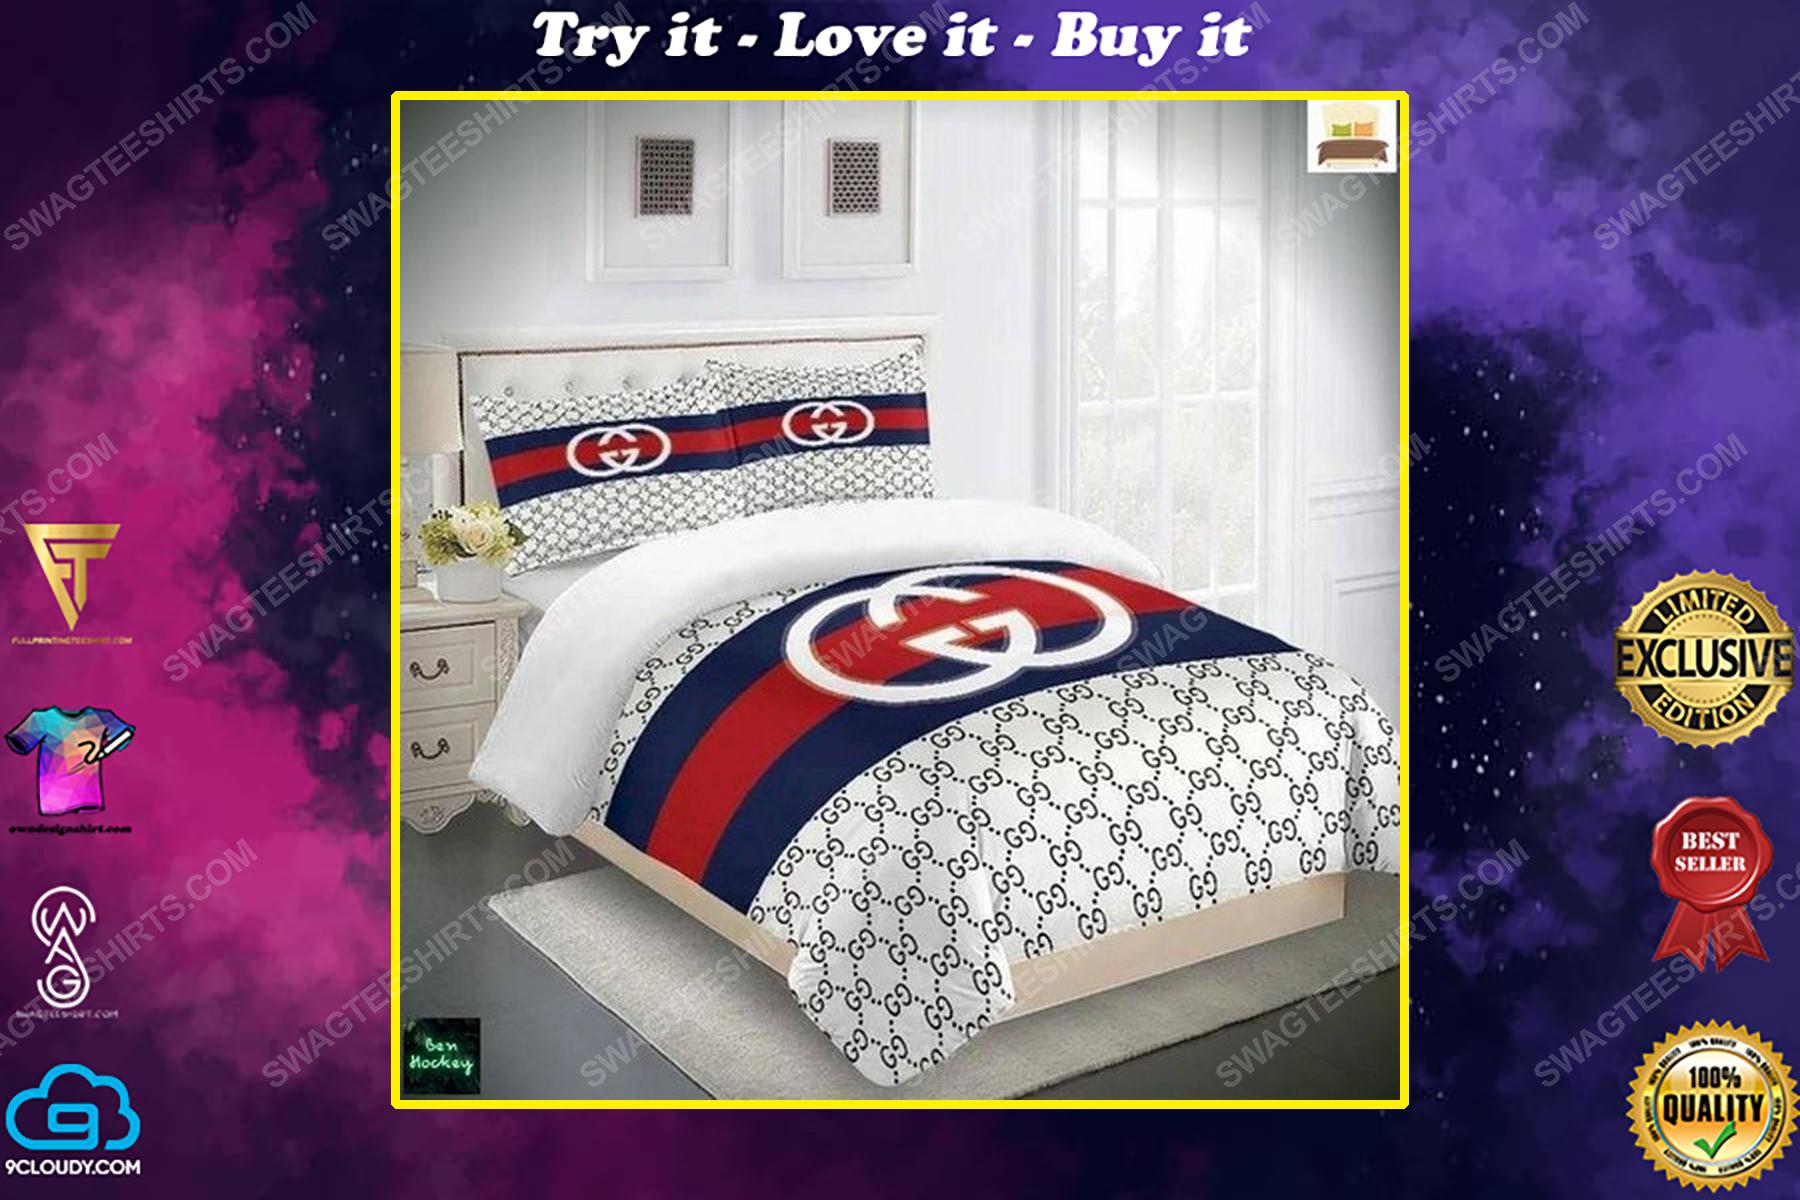 Gucci monogram symbols full print duvet cover bedding set